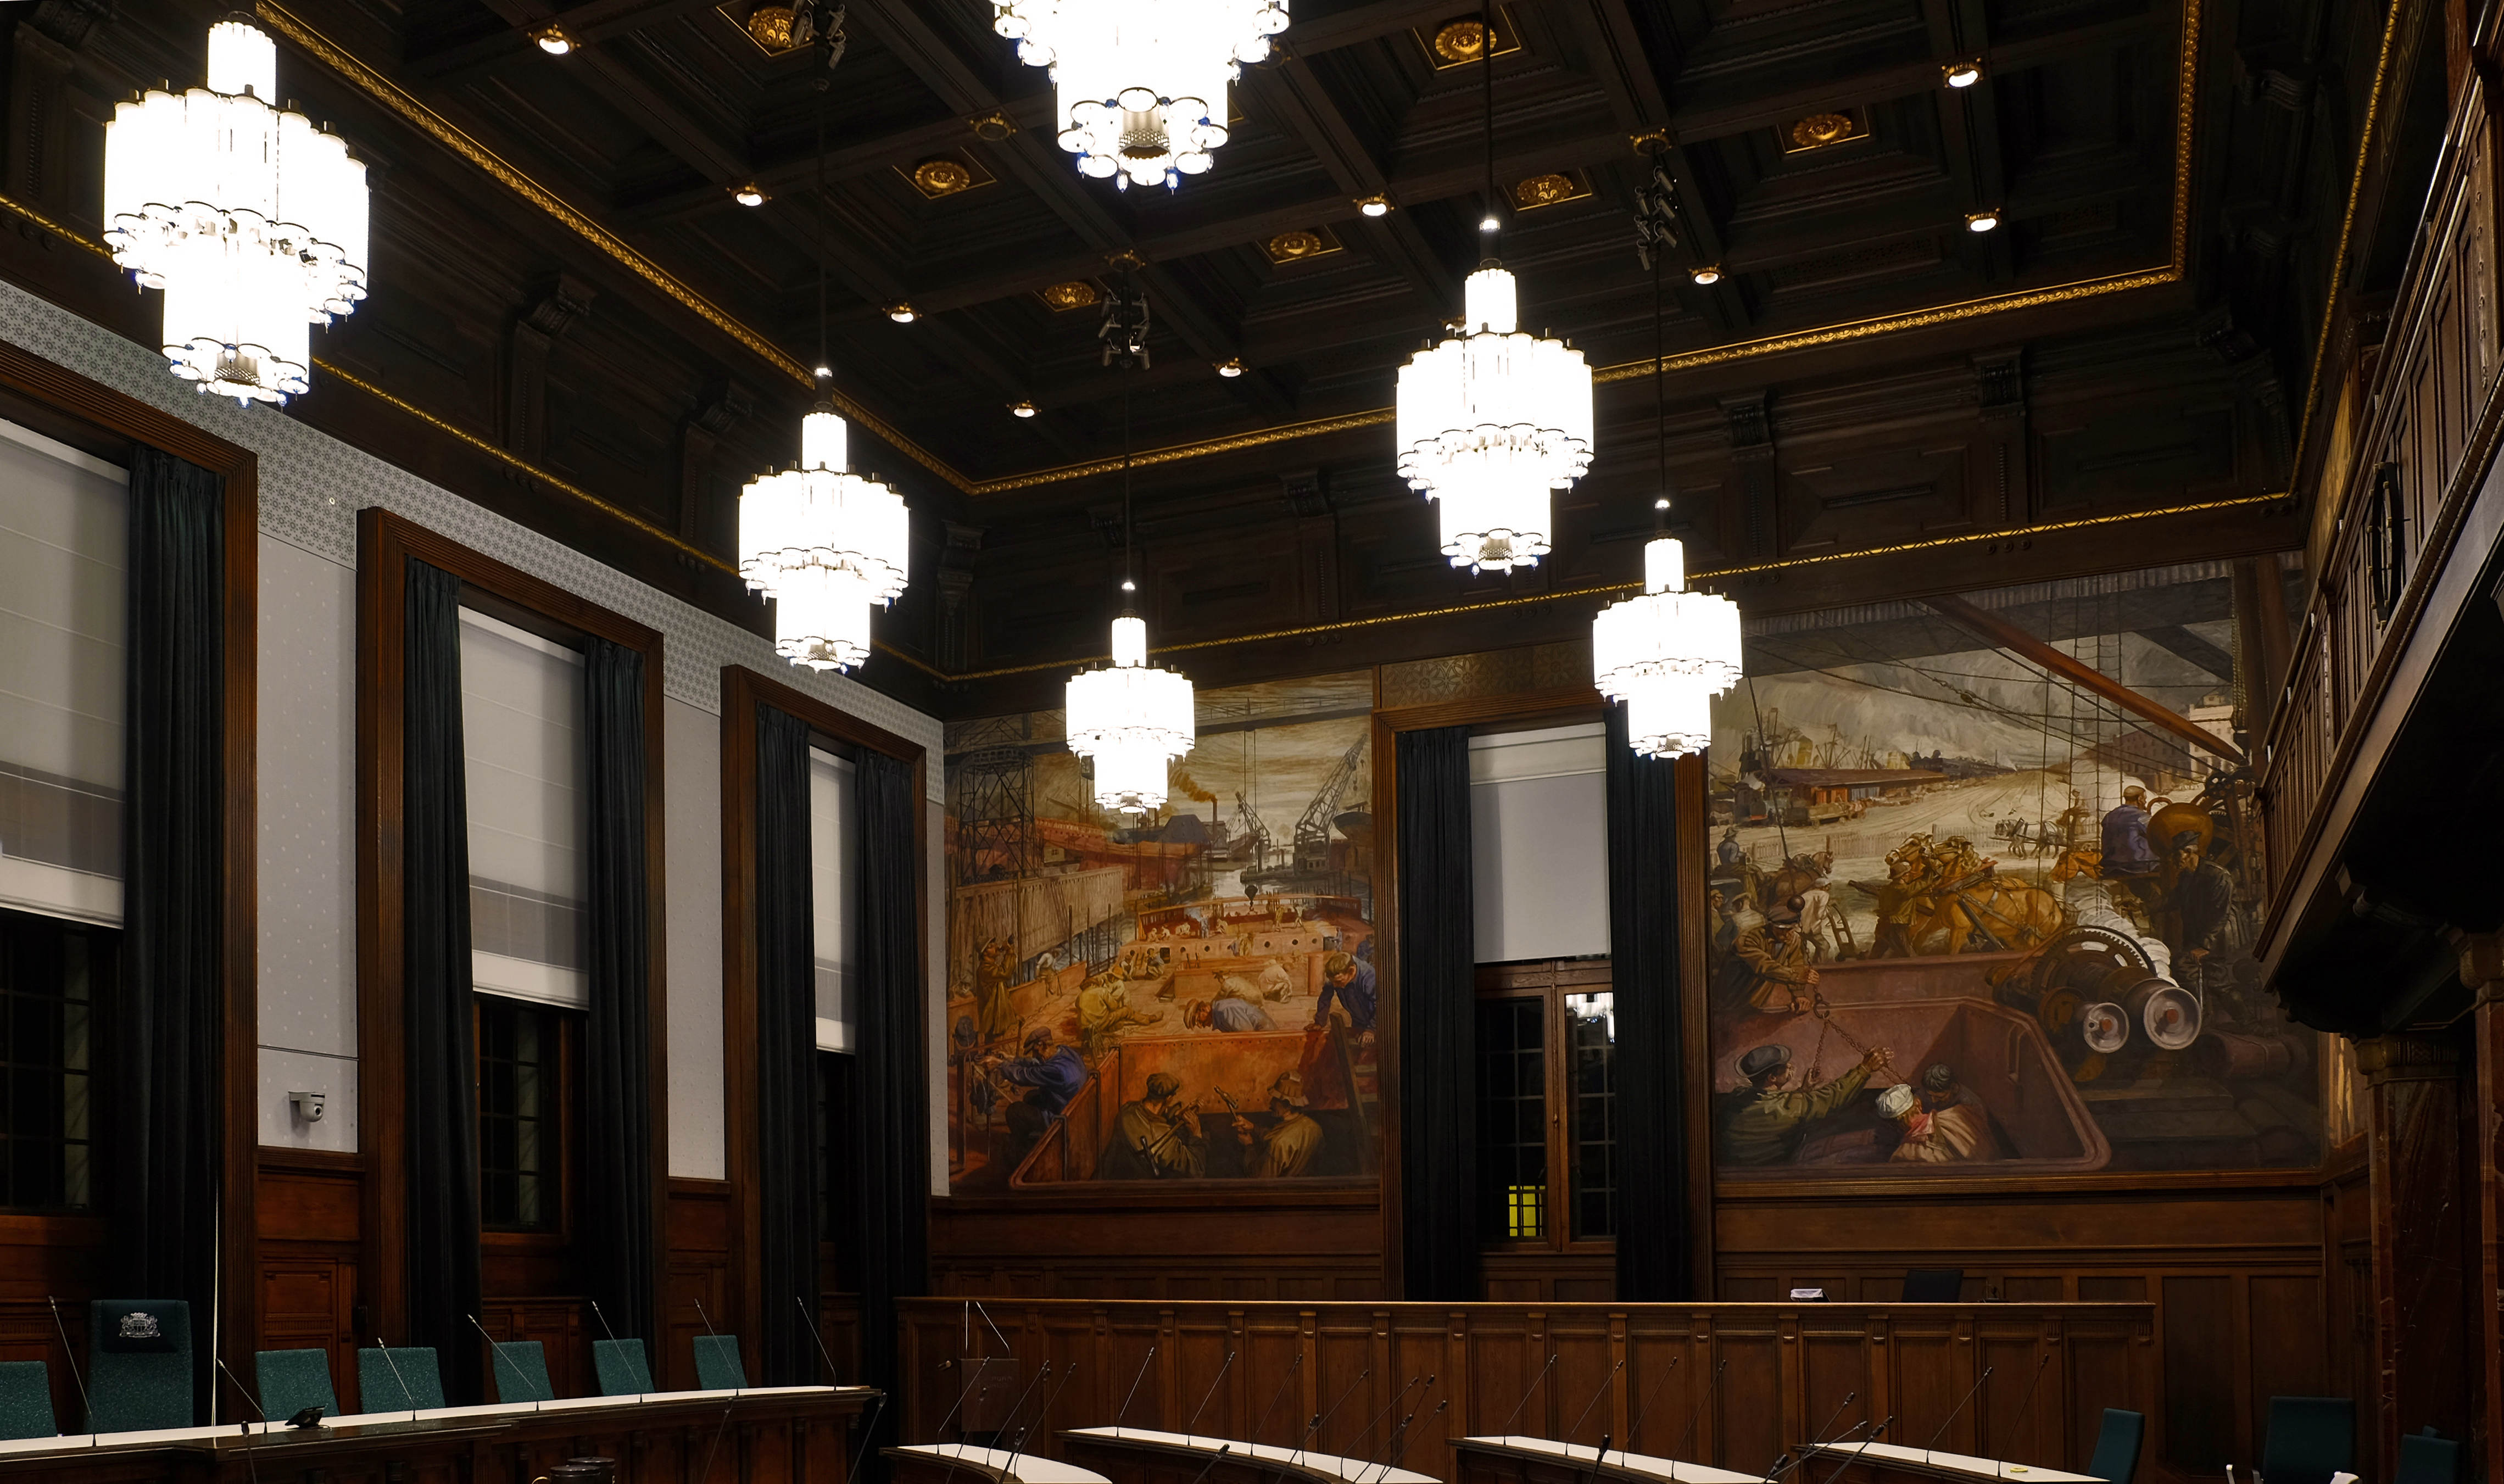 kronen weer terug - Raadzaal Rotterdam Stadhuis